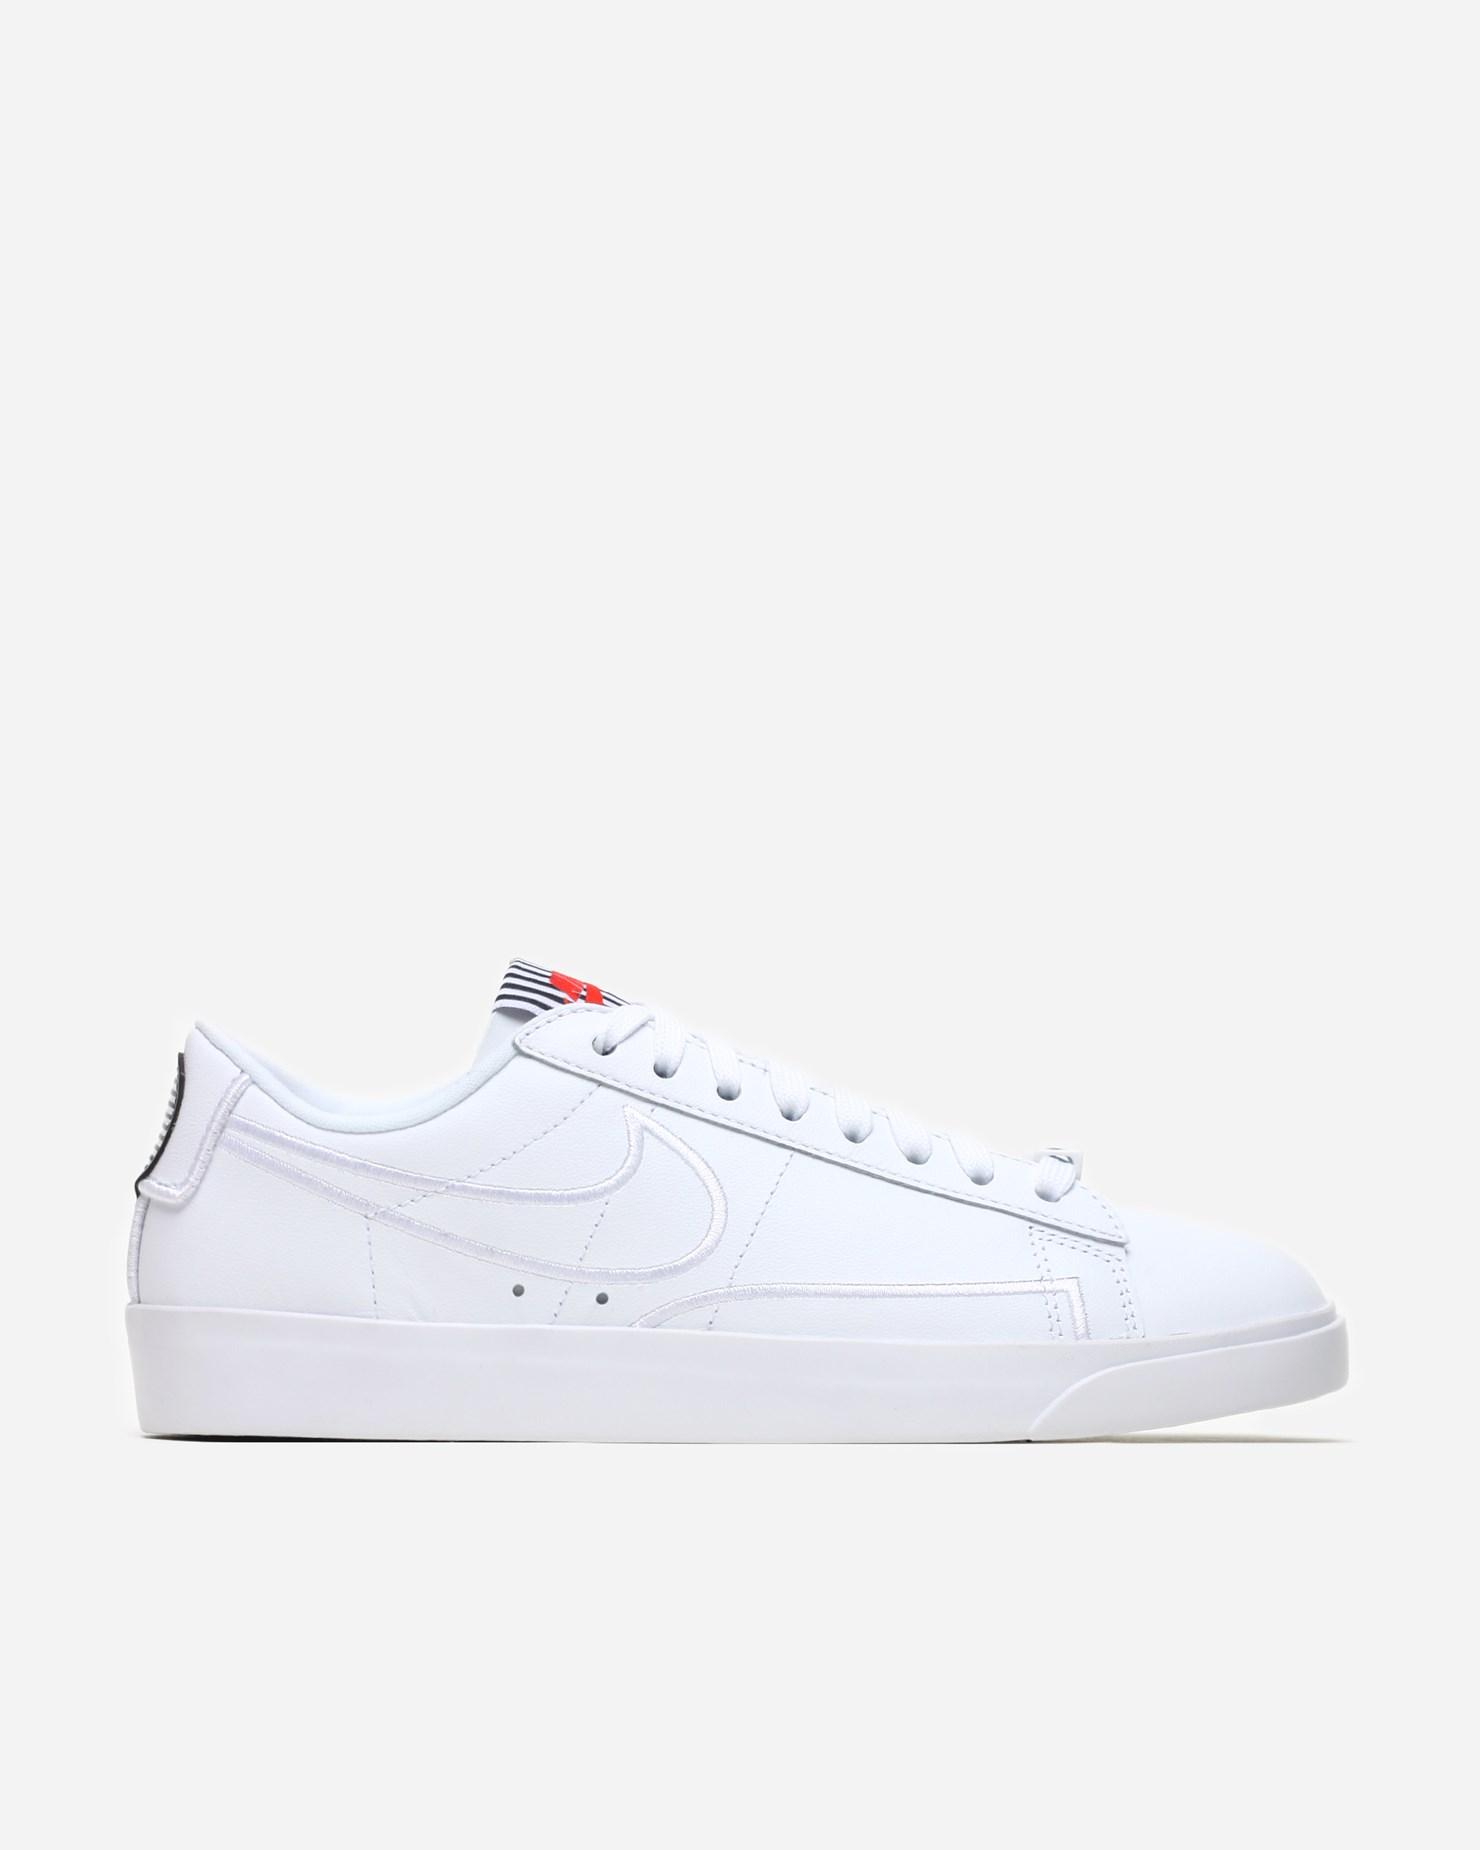 Nike AA2017-003 Nike Blazer Low LX Womens Shoe - Nike